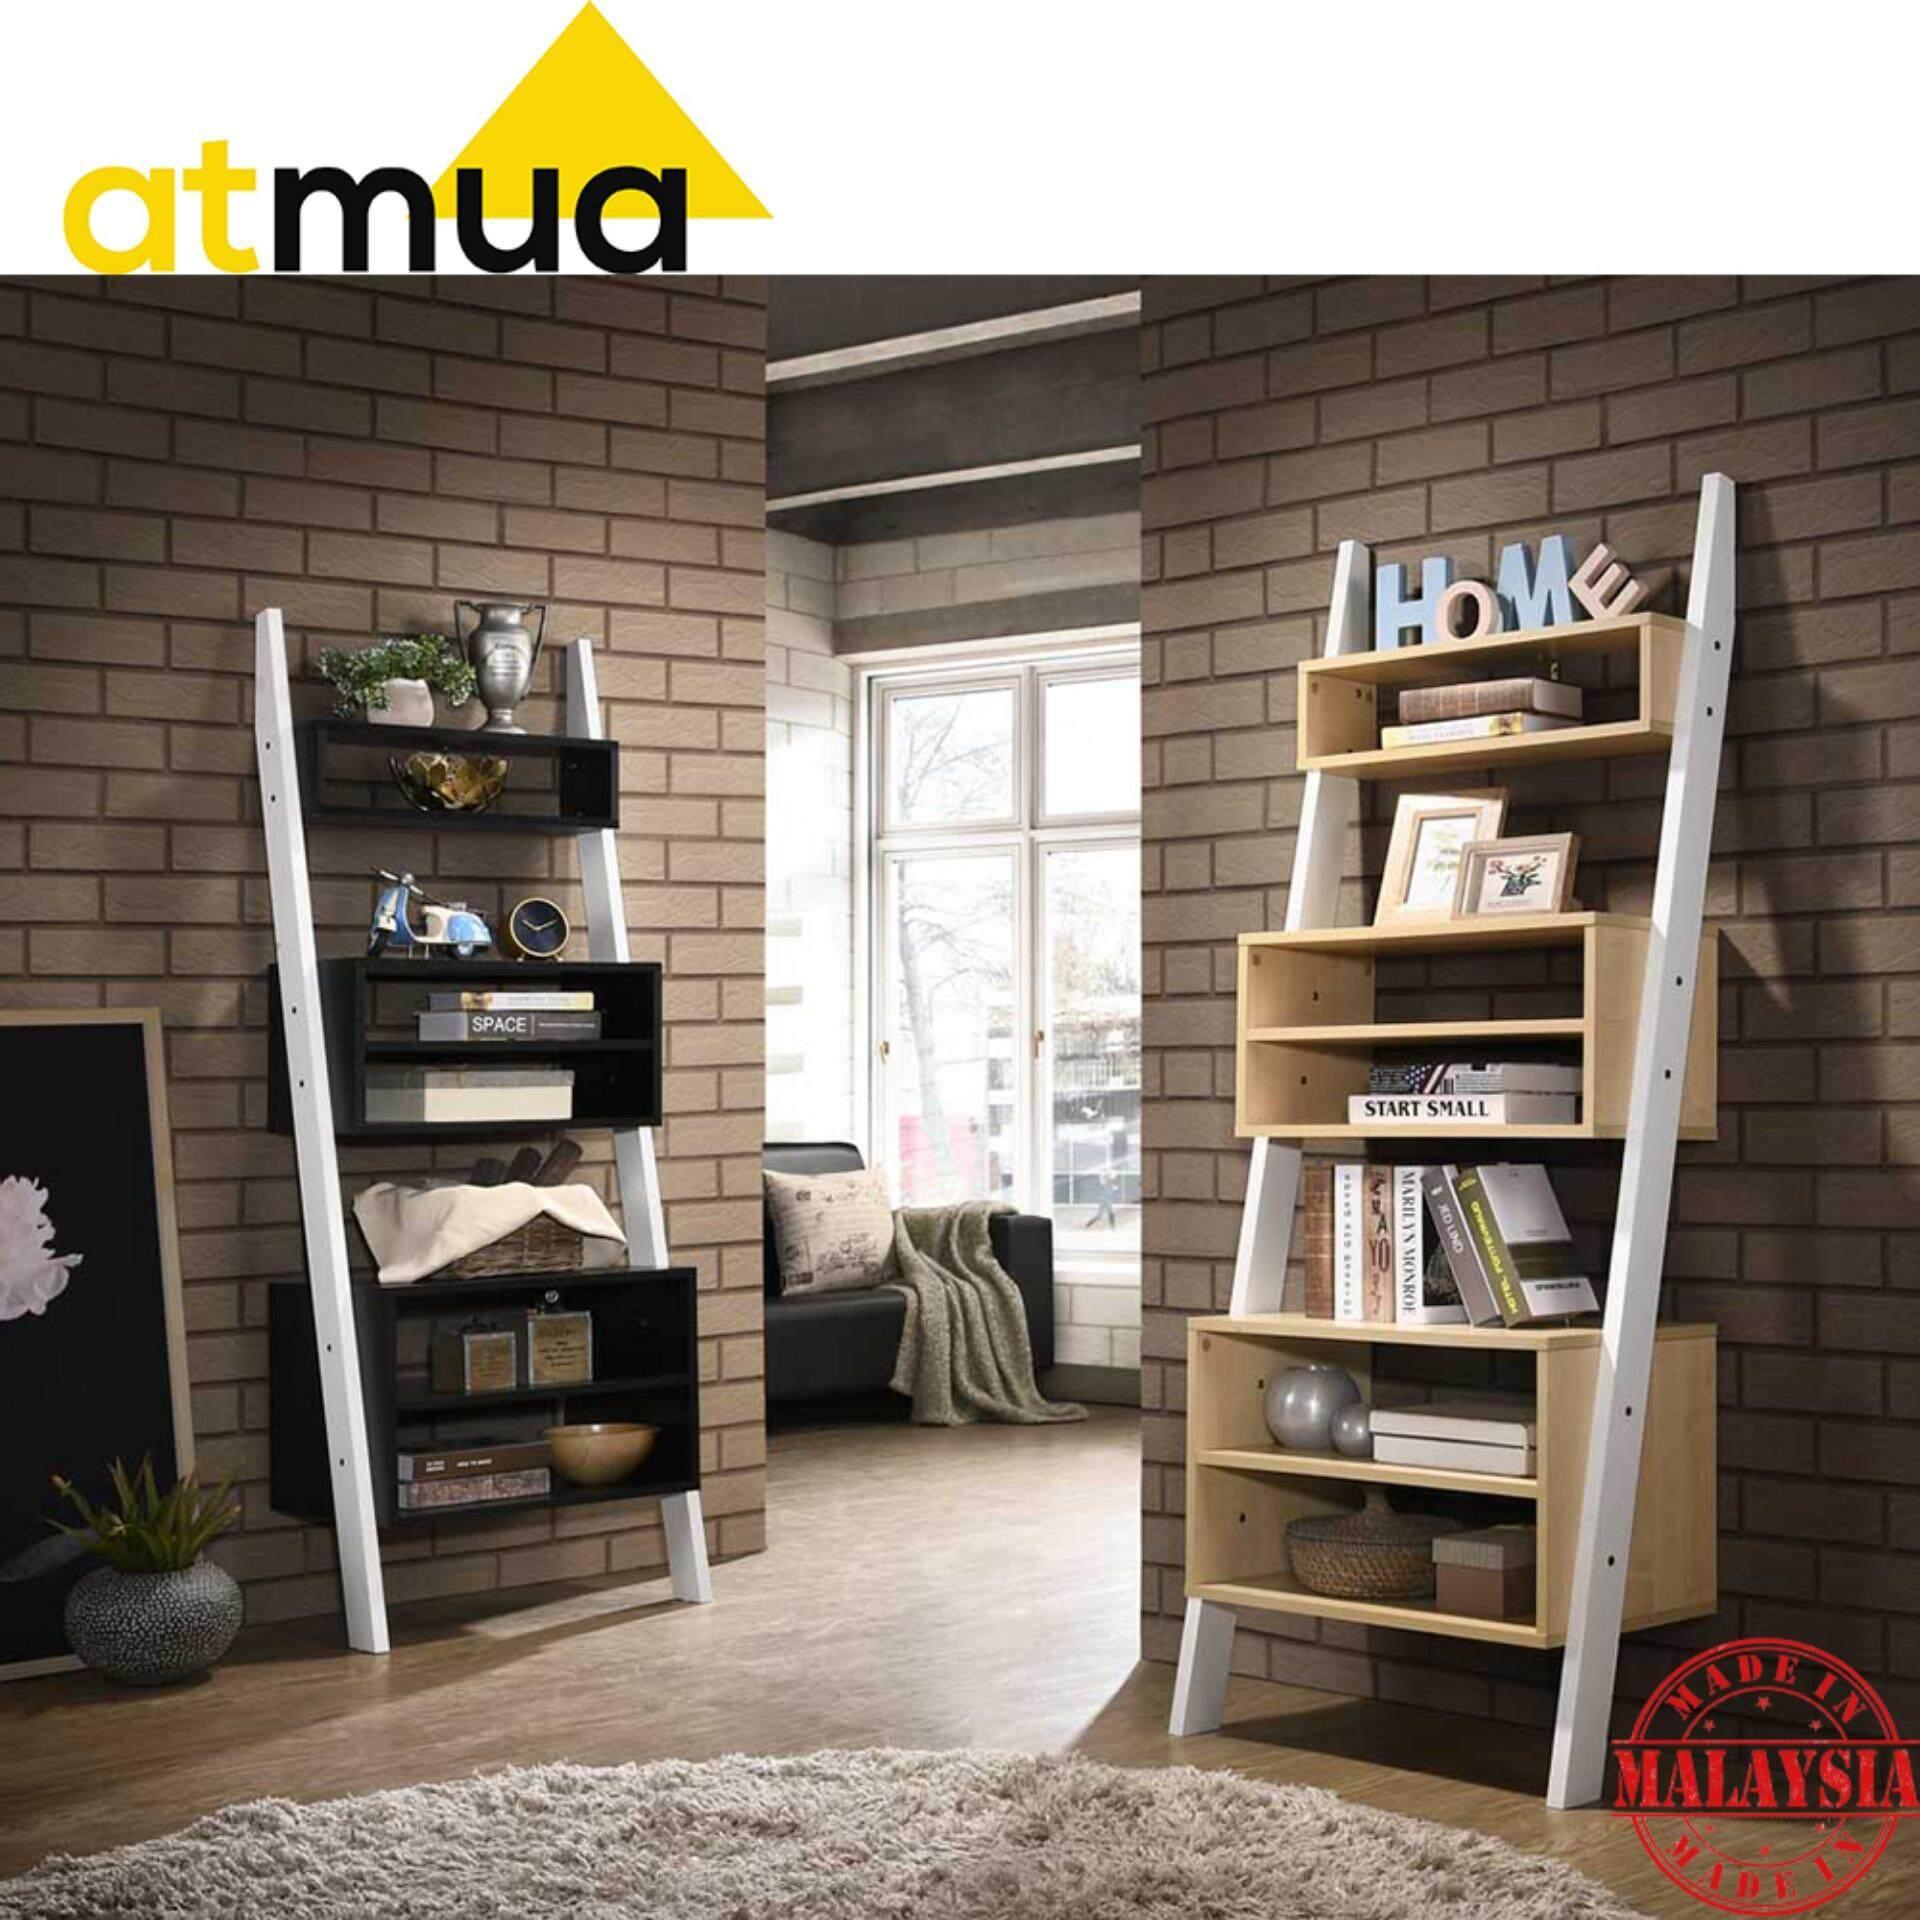 Atmua Chin Ladder Storage Rack Display Cabinet (Modern Design) [Particle Board]